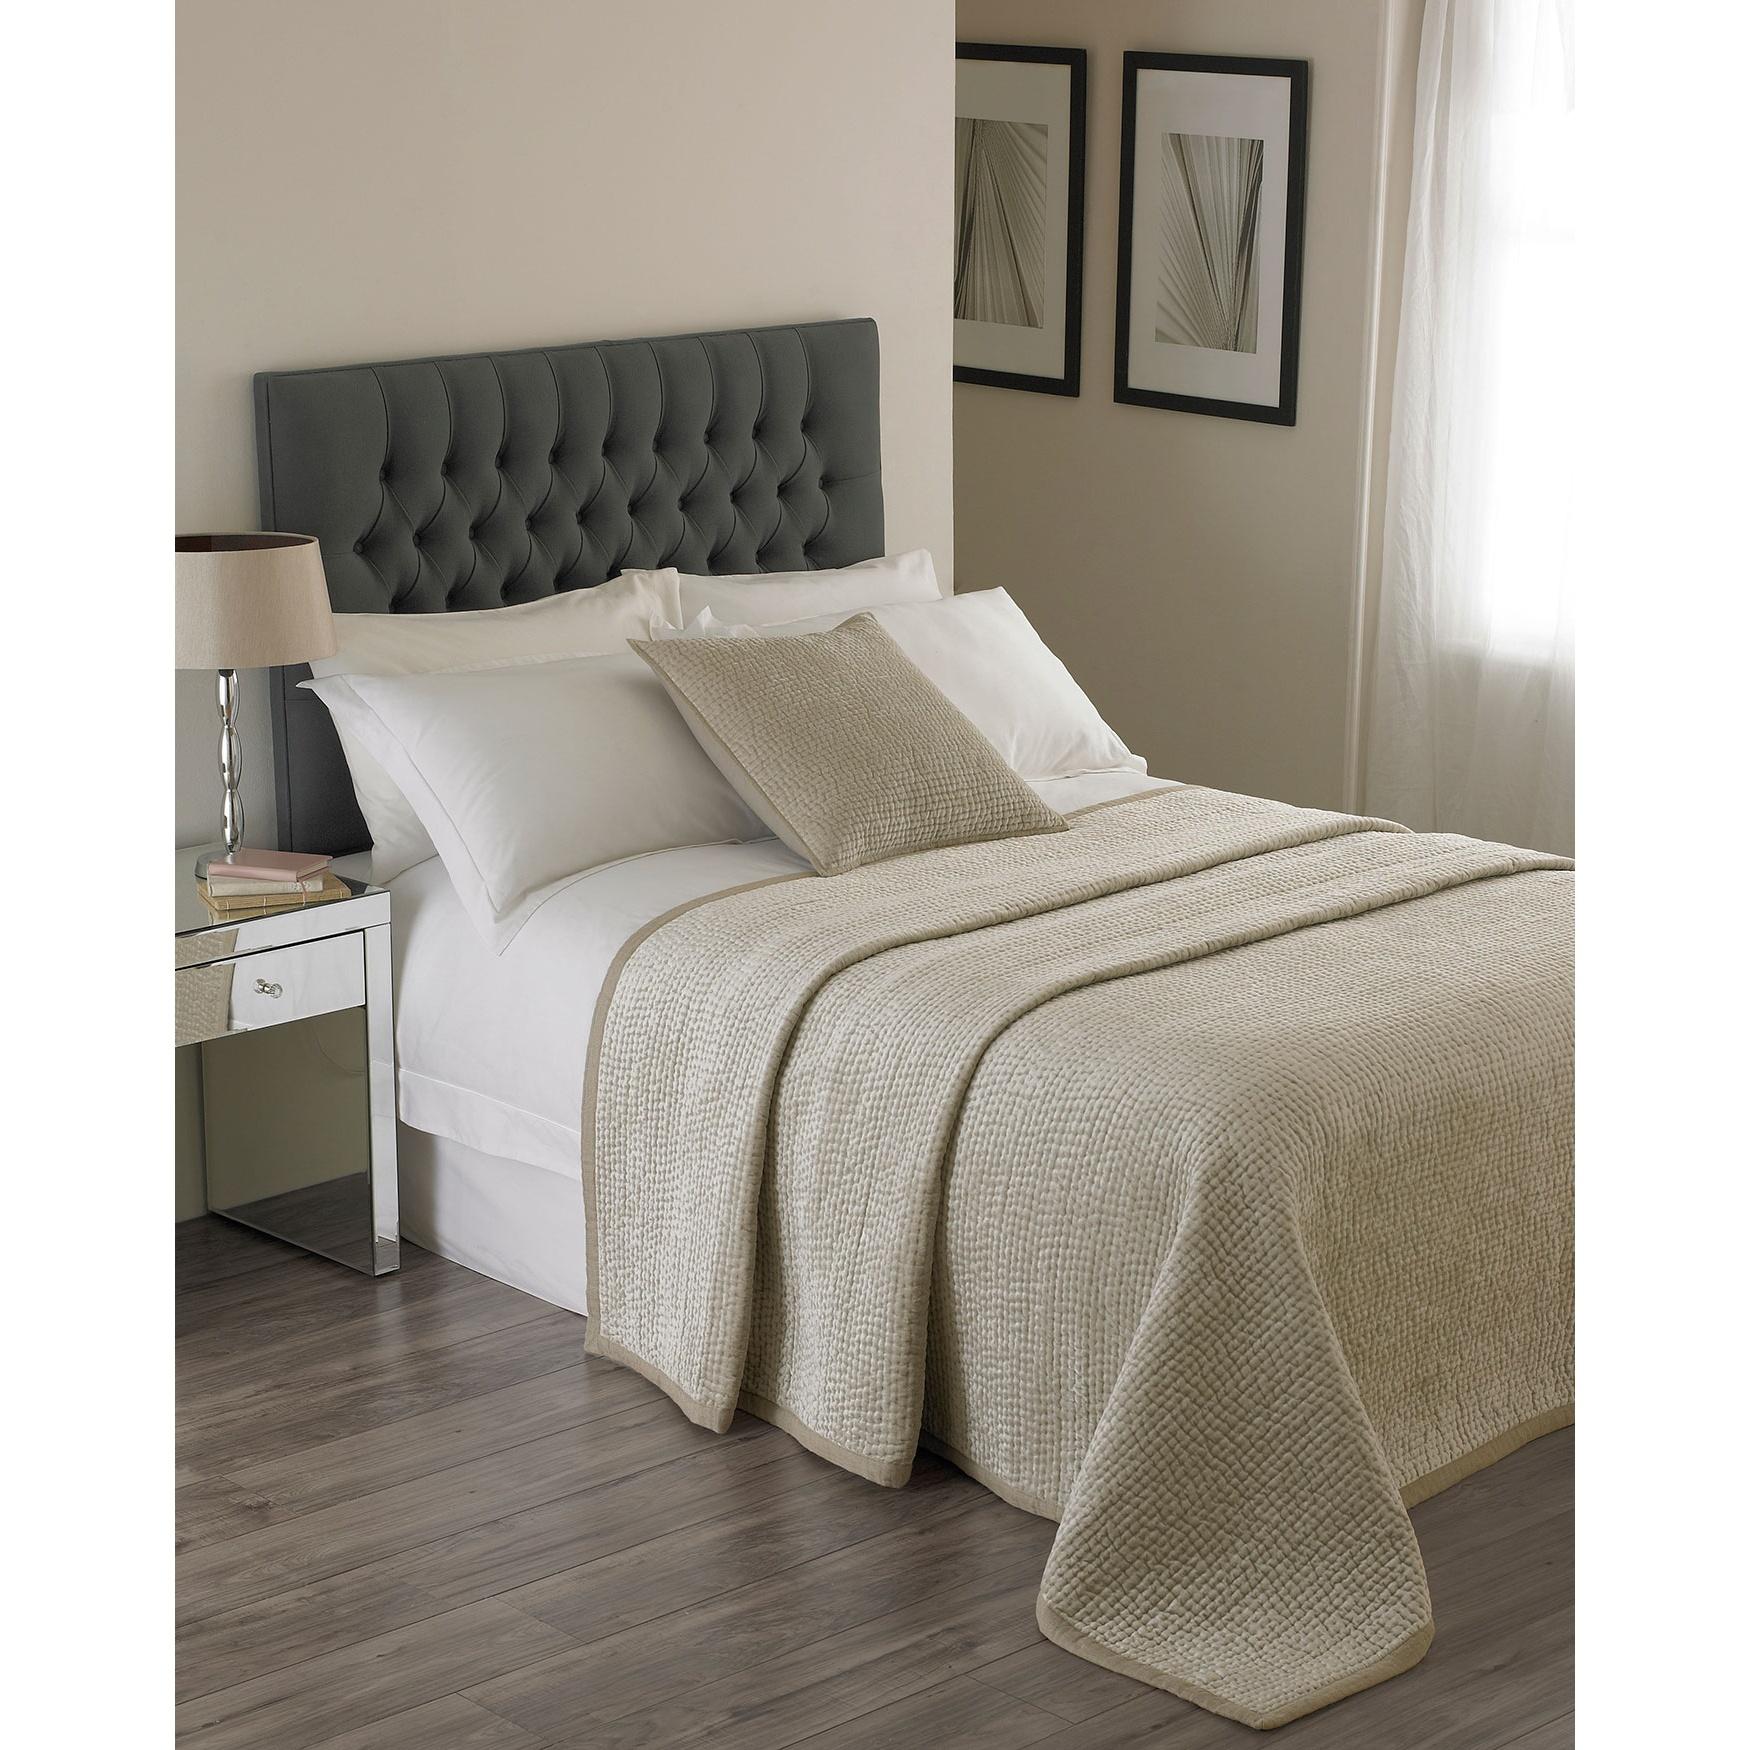 Riva Home Brooklands Bedspread (265x265cm) (Champagne)